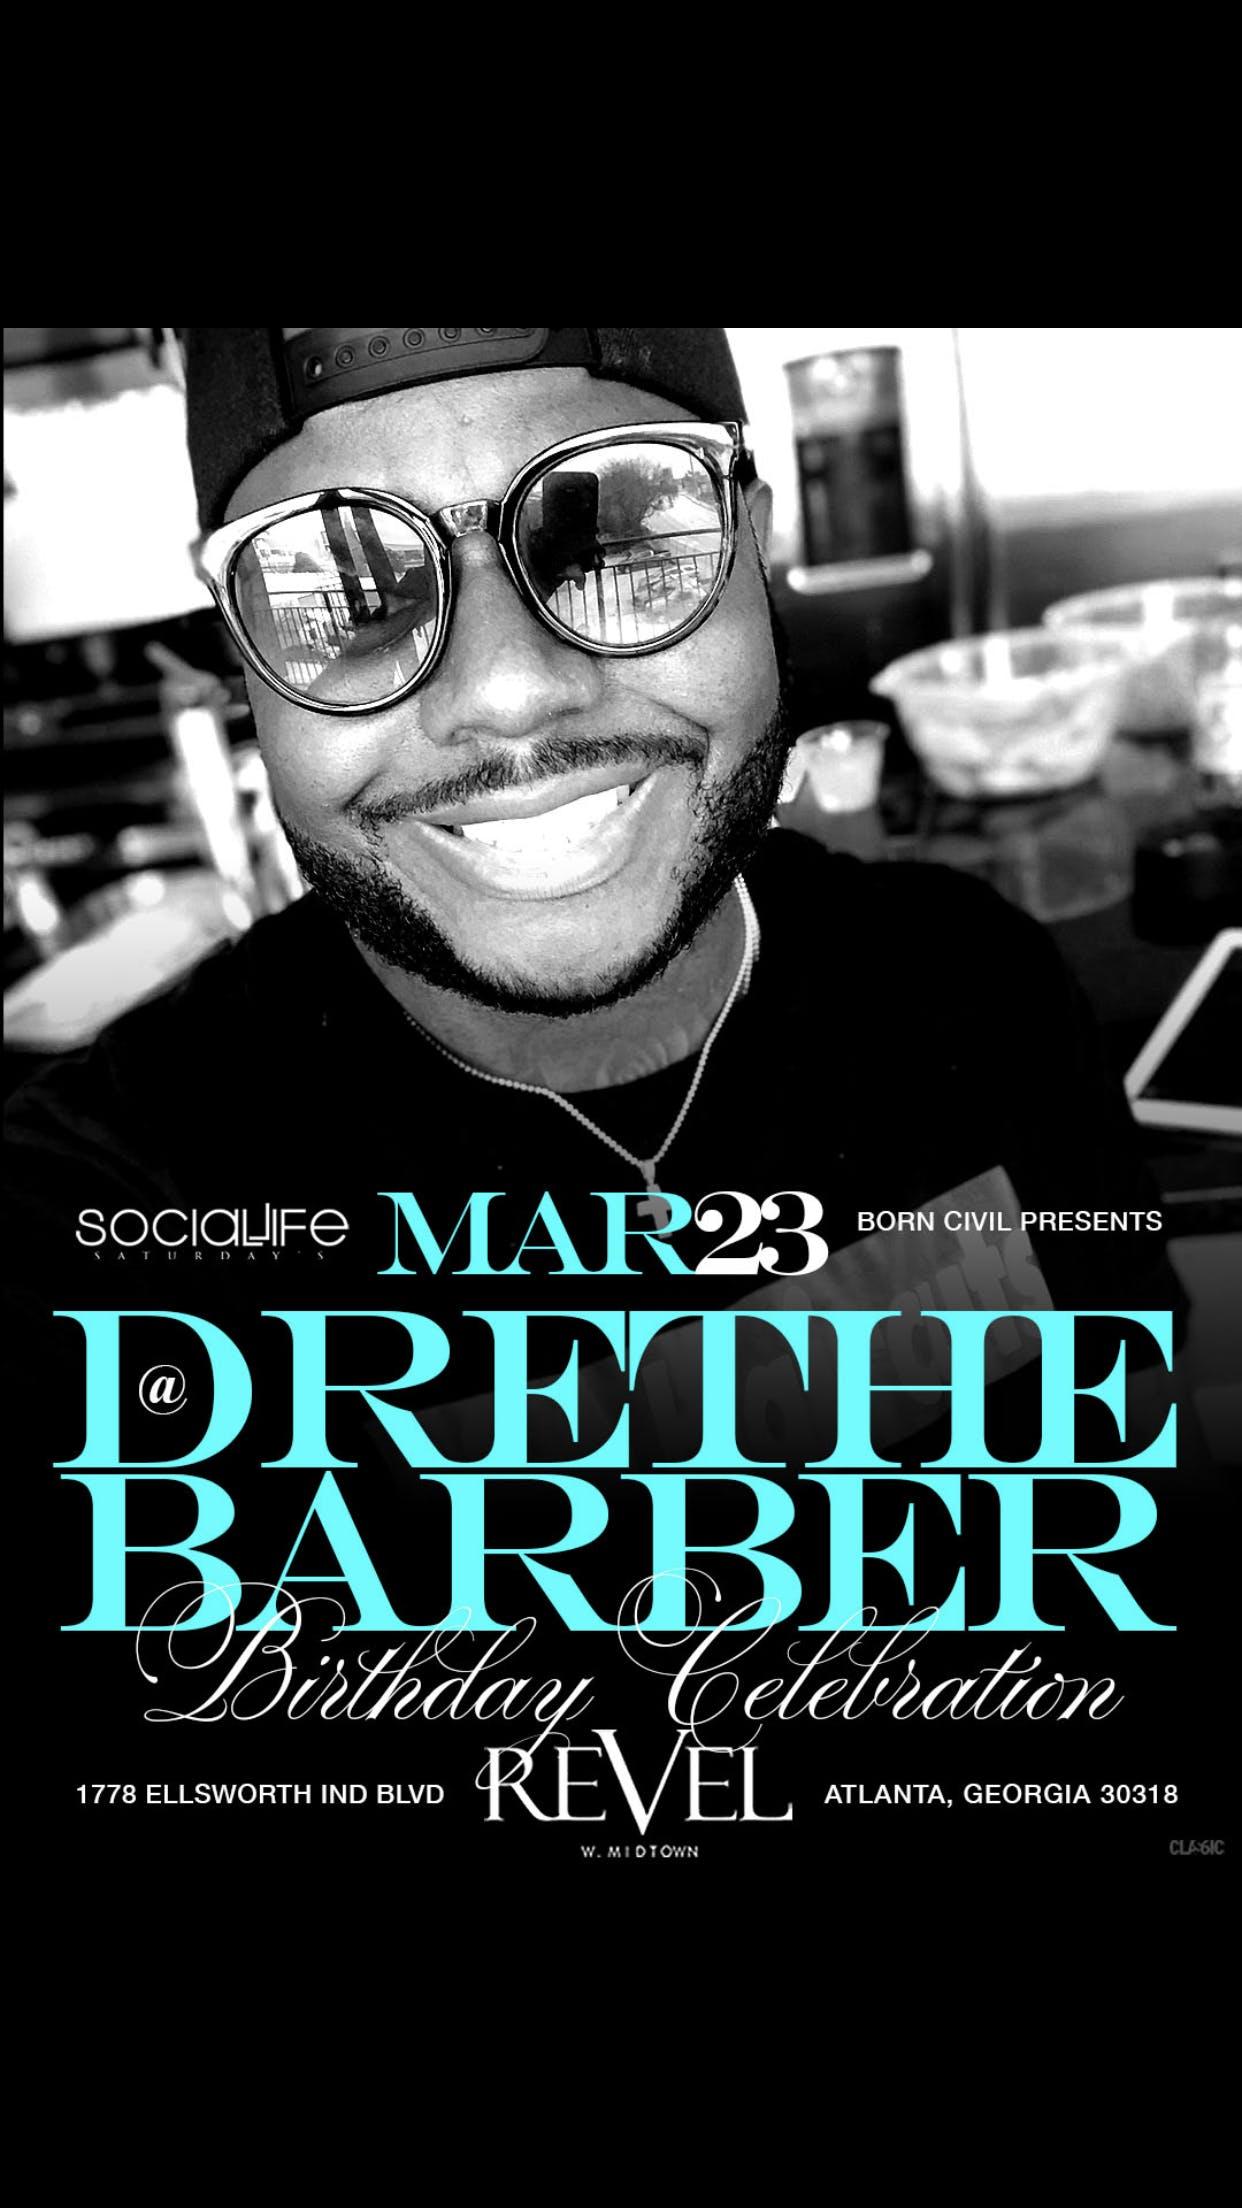 Dre the Barber's Official Birthday Celebratio